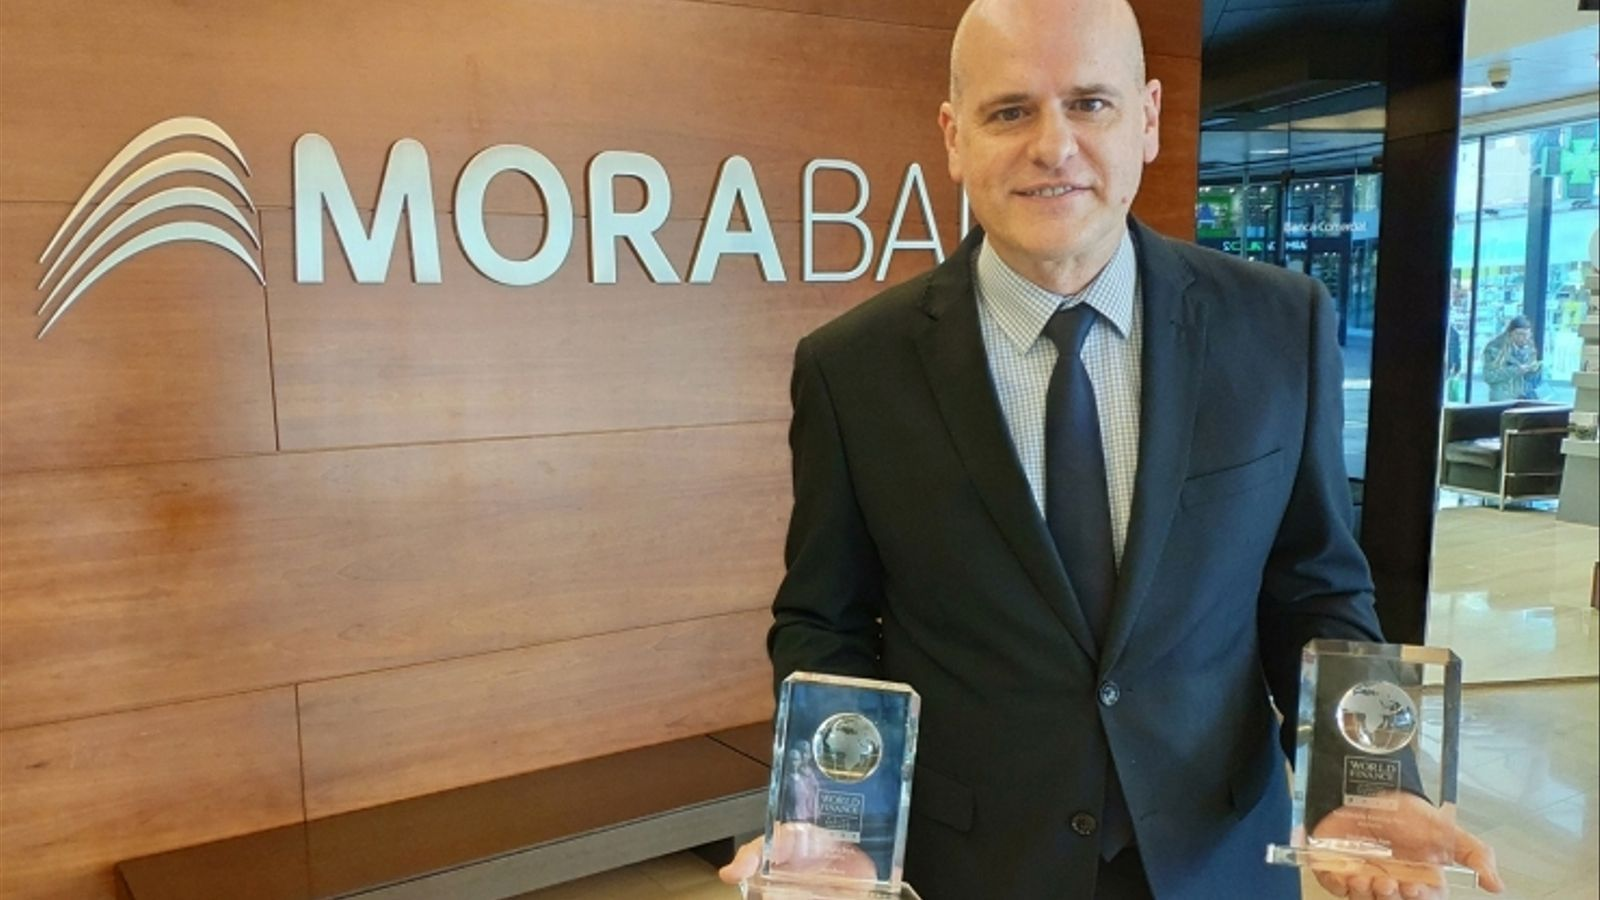 Ignasi Martín, director de Banca Digital de MoraBanc. / MORABANC